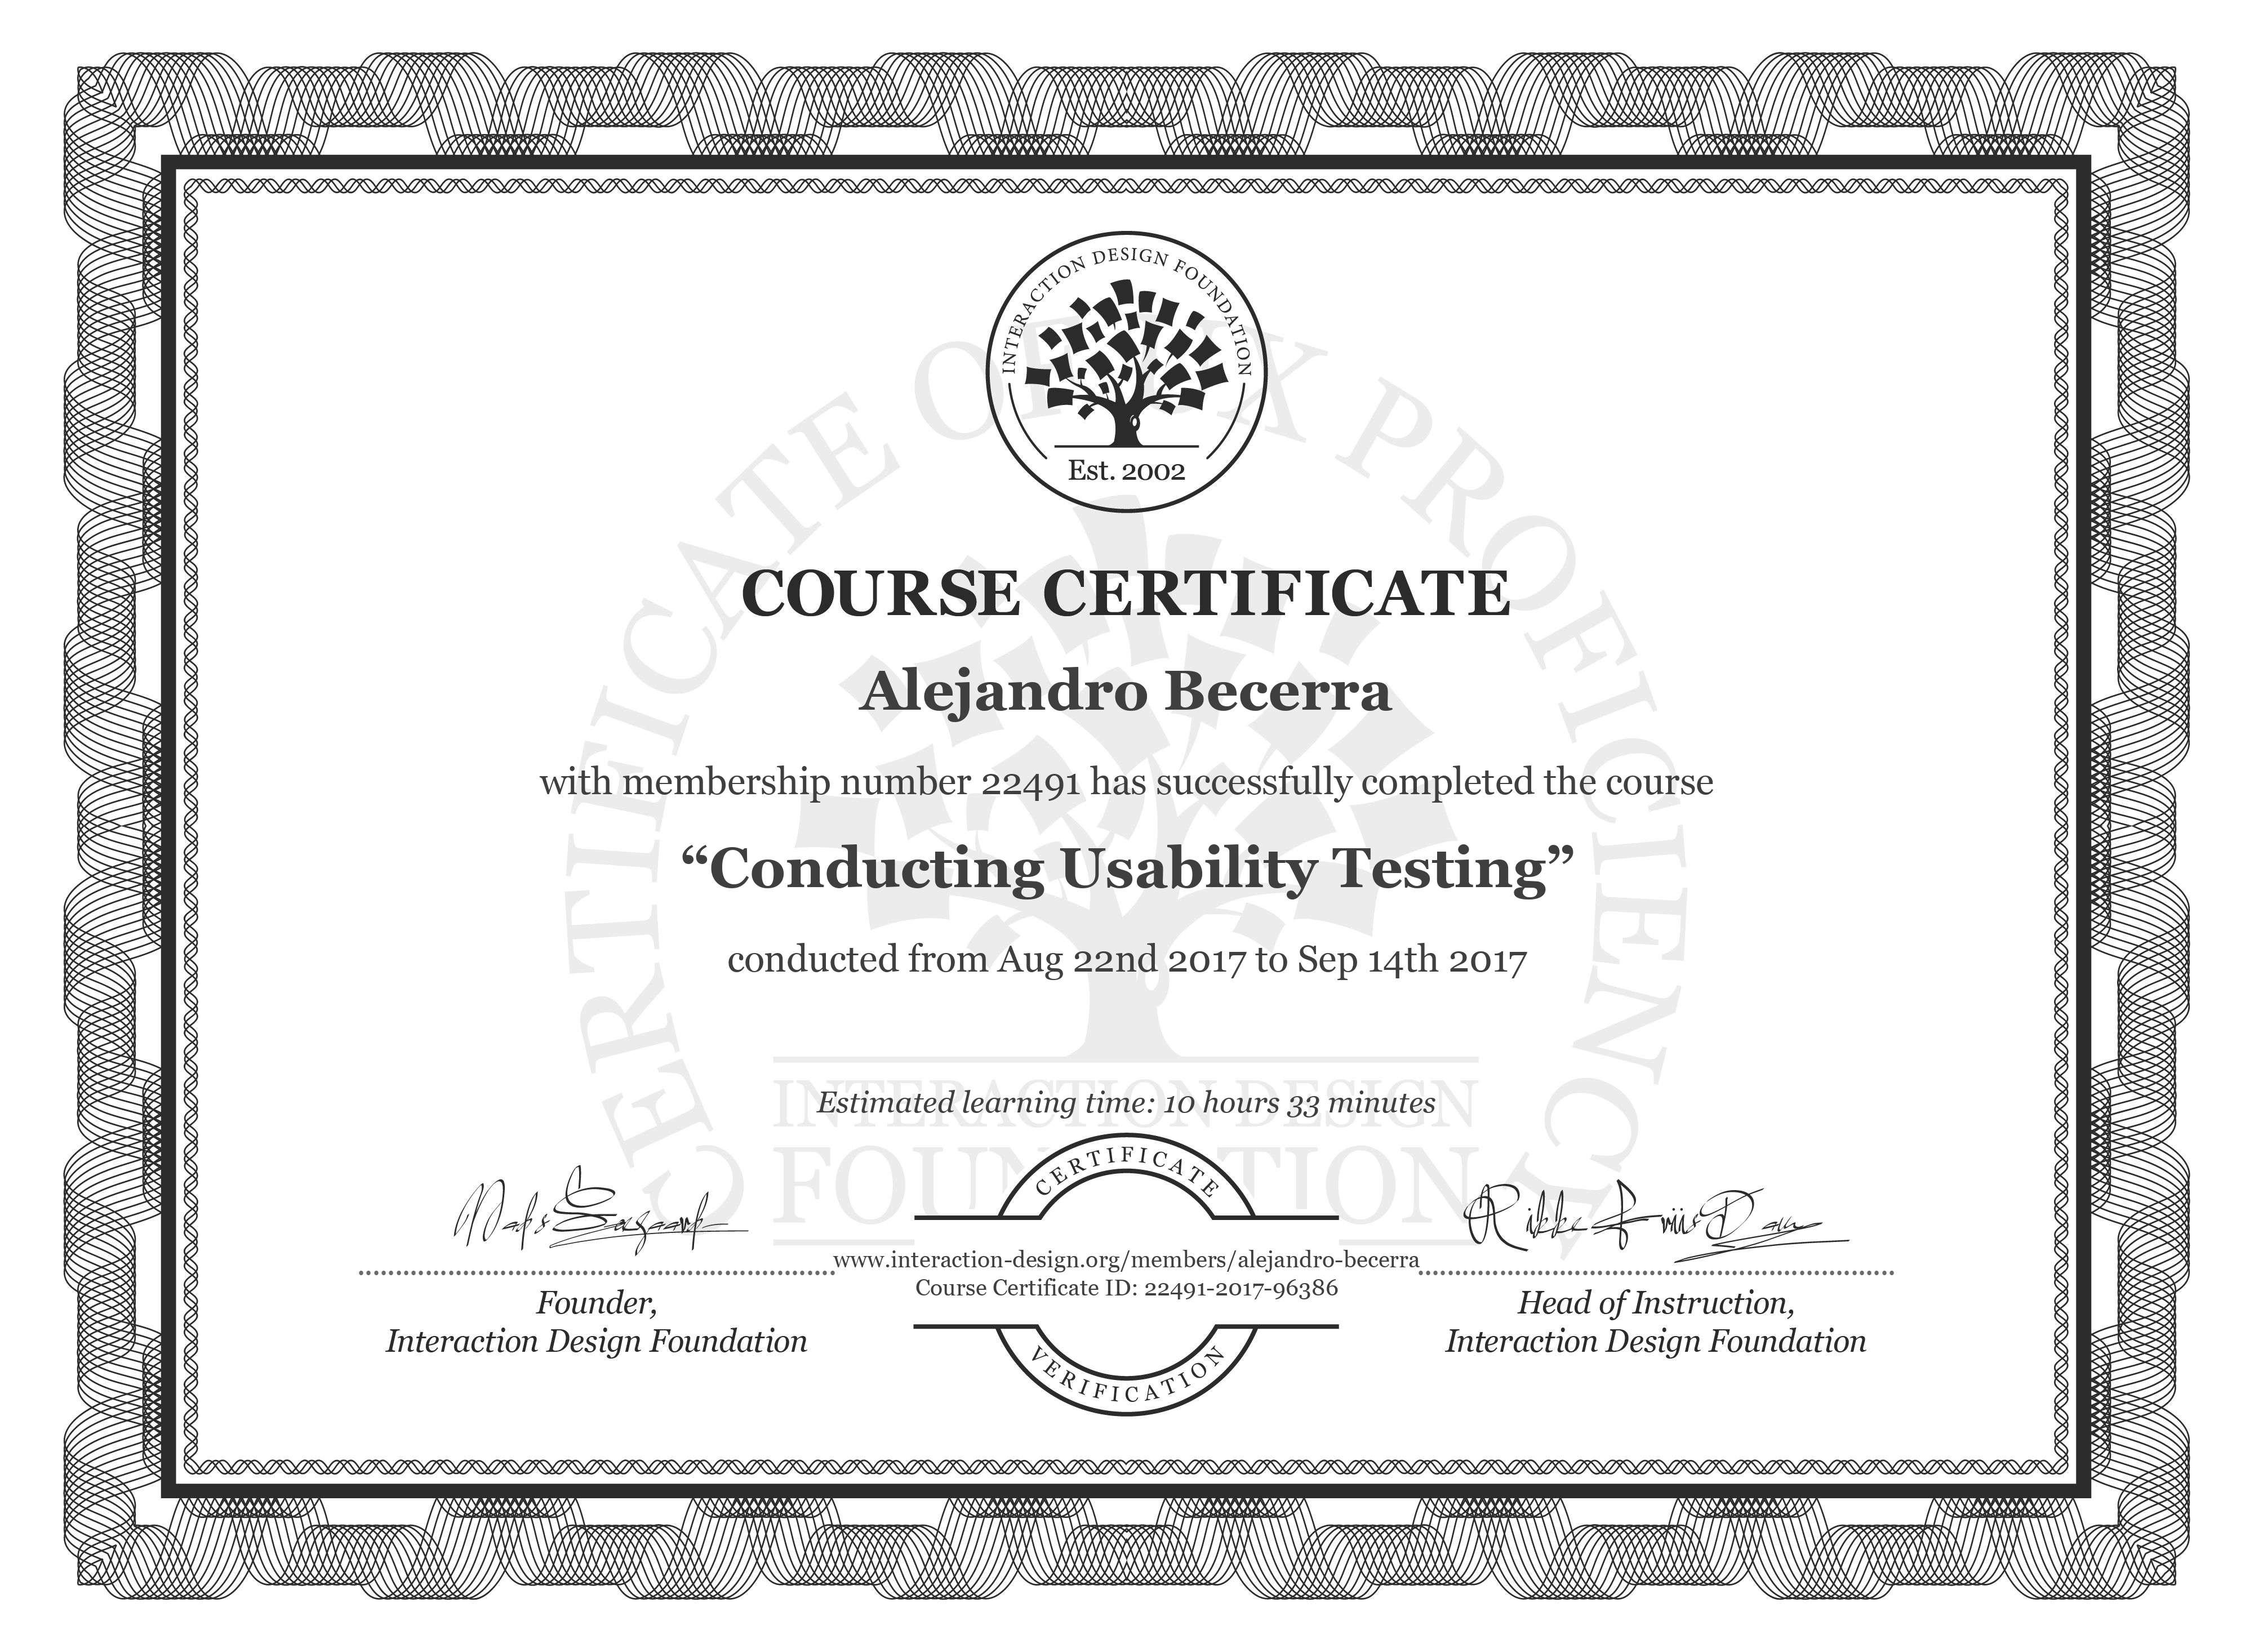 Alejandro Becerra: Course Certificate - Conducting Usability Testing